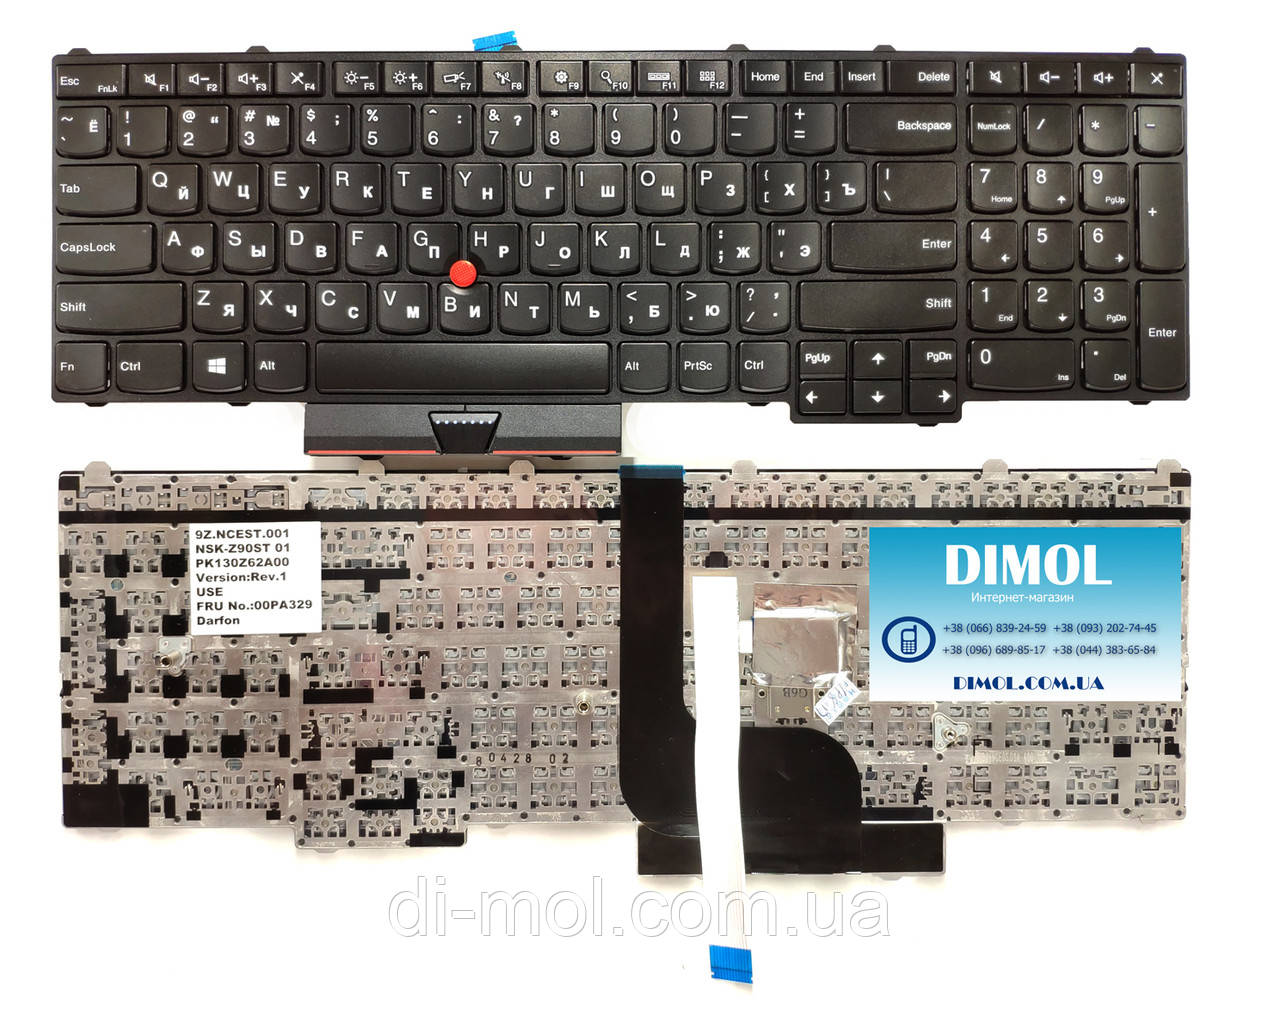 Оригинальная клавиатура для ноутбука Lenovo ThinkPad P50, ThinkPad P70 series, rus, black